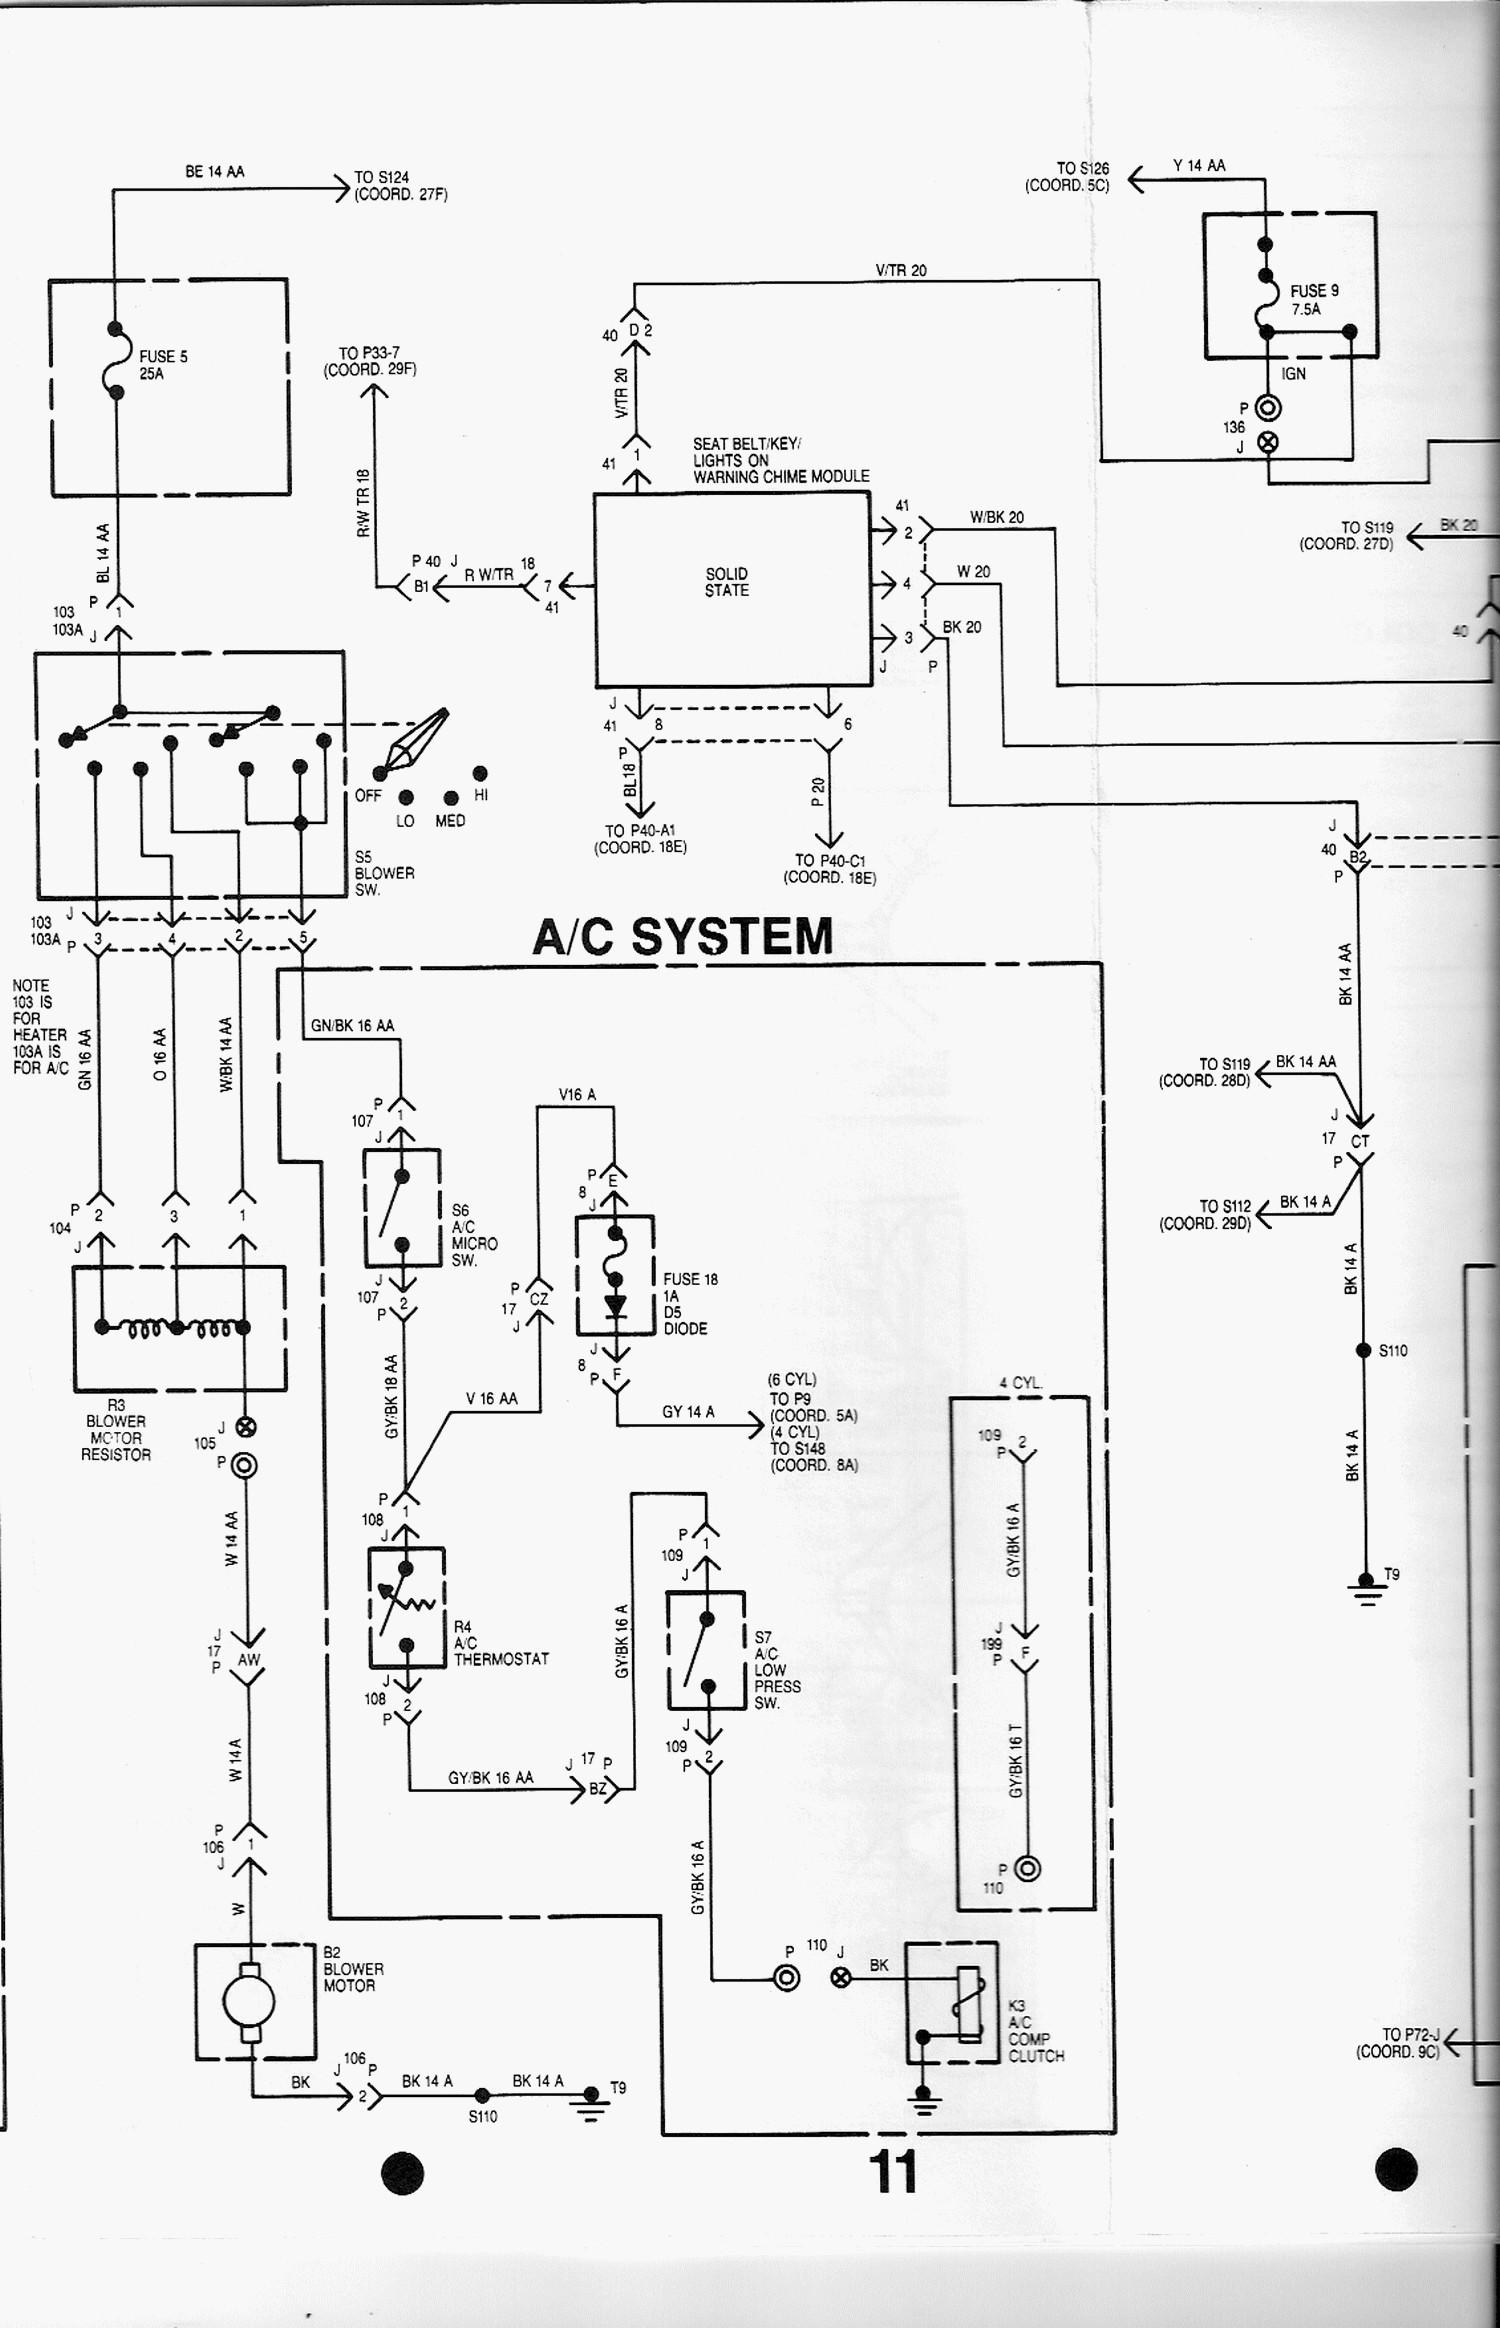 1978 jeep cj5 wiring diagram palm pain 1985 amc eagle vacuum imageresizertool com